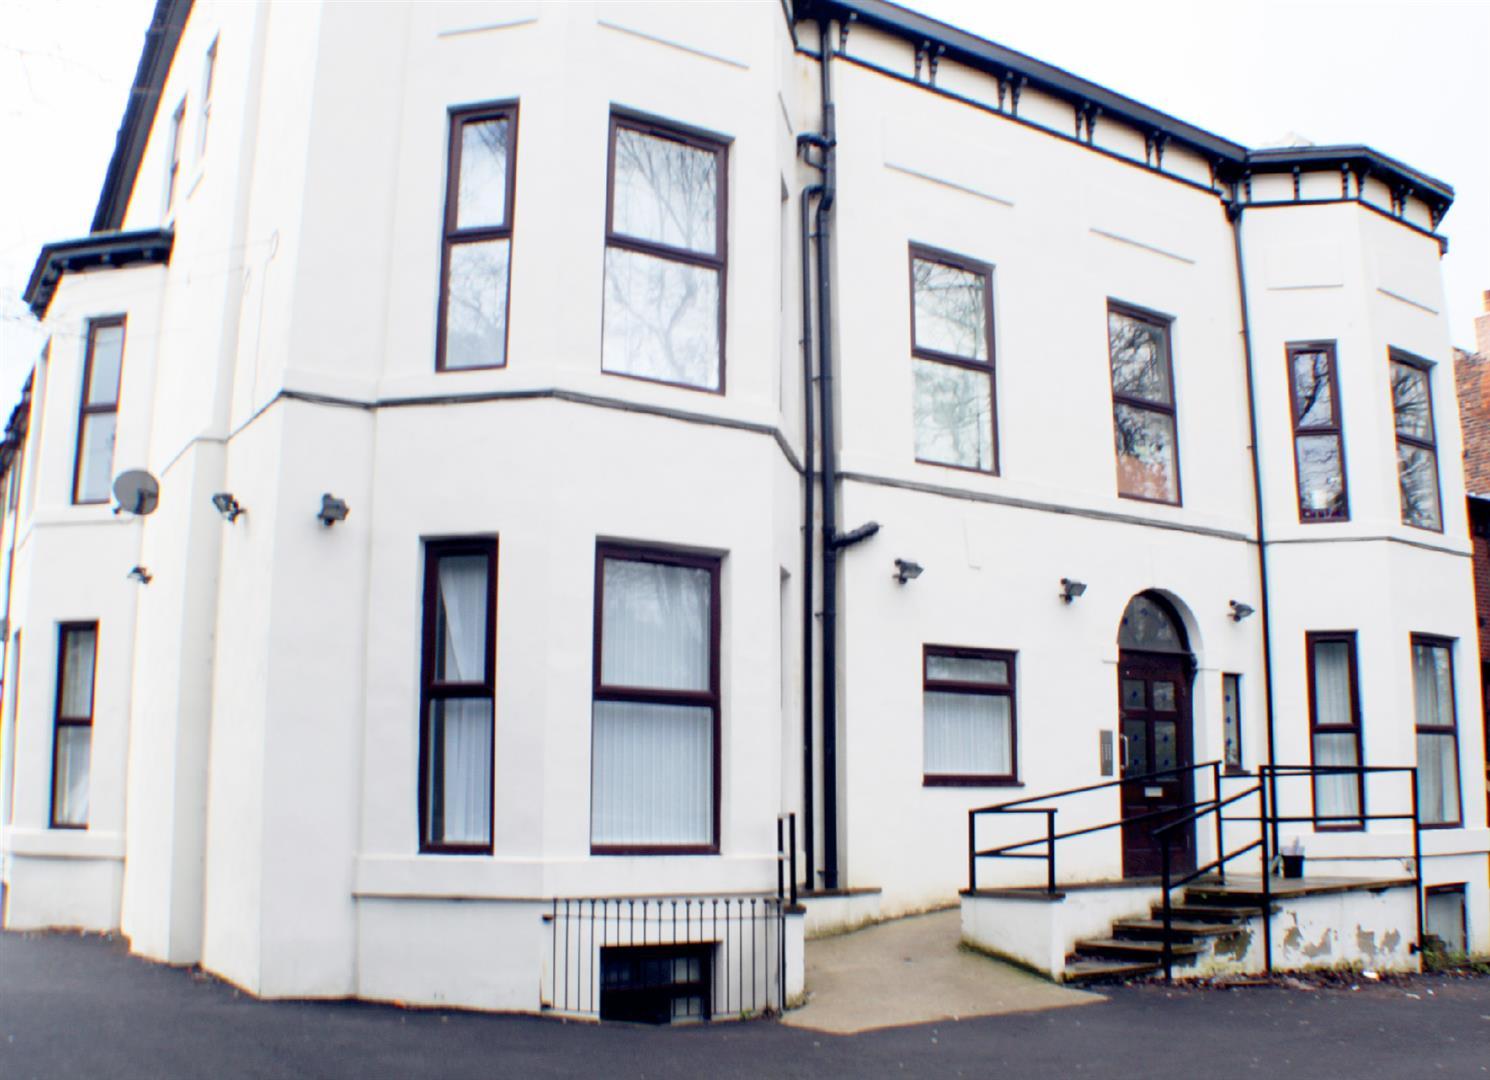 2 Bedrooms Flat for sale in Half Edge Lane, Monton, Manchester